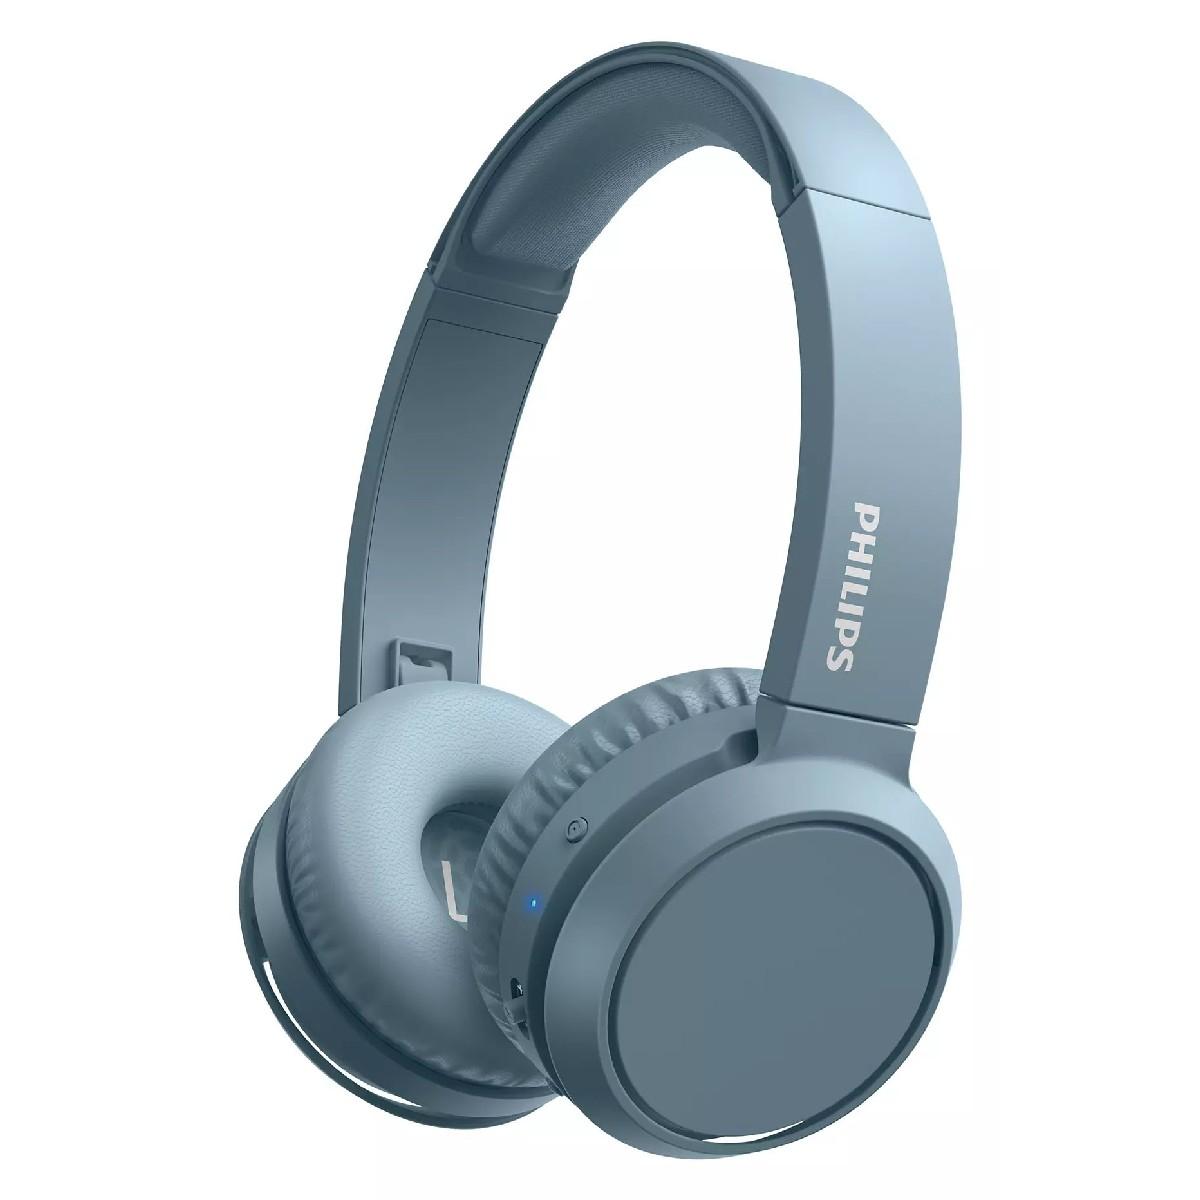 Bluetooth Ακουστικά Stereo Philips TAH4205BL/00 Μπλέ με Μικρόφωνο για Κινητά Τηλέφωνα και Συσκευές Ήχου